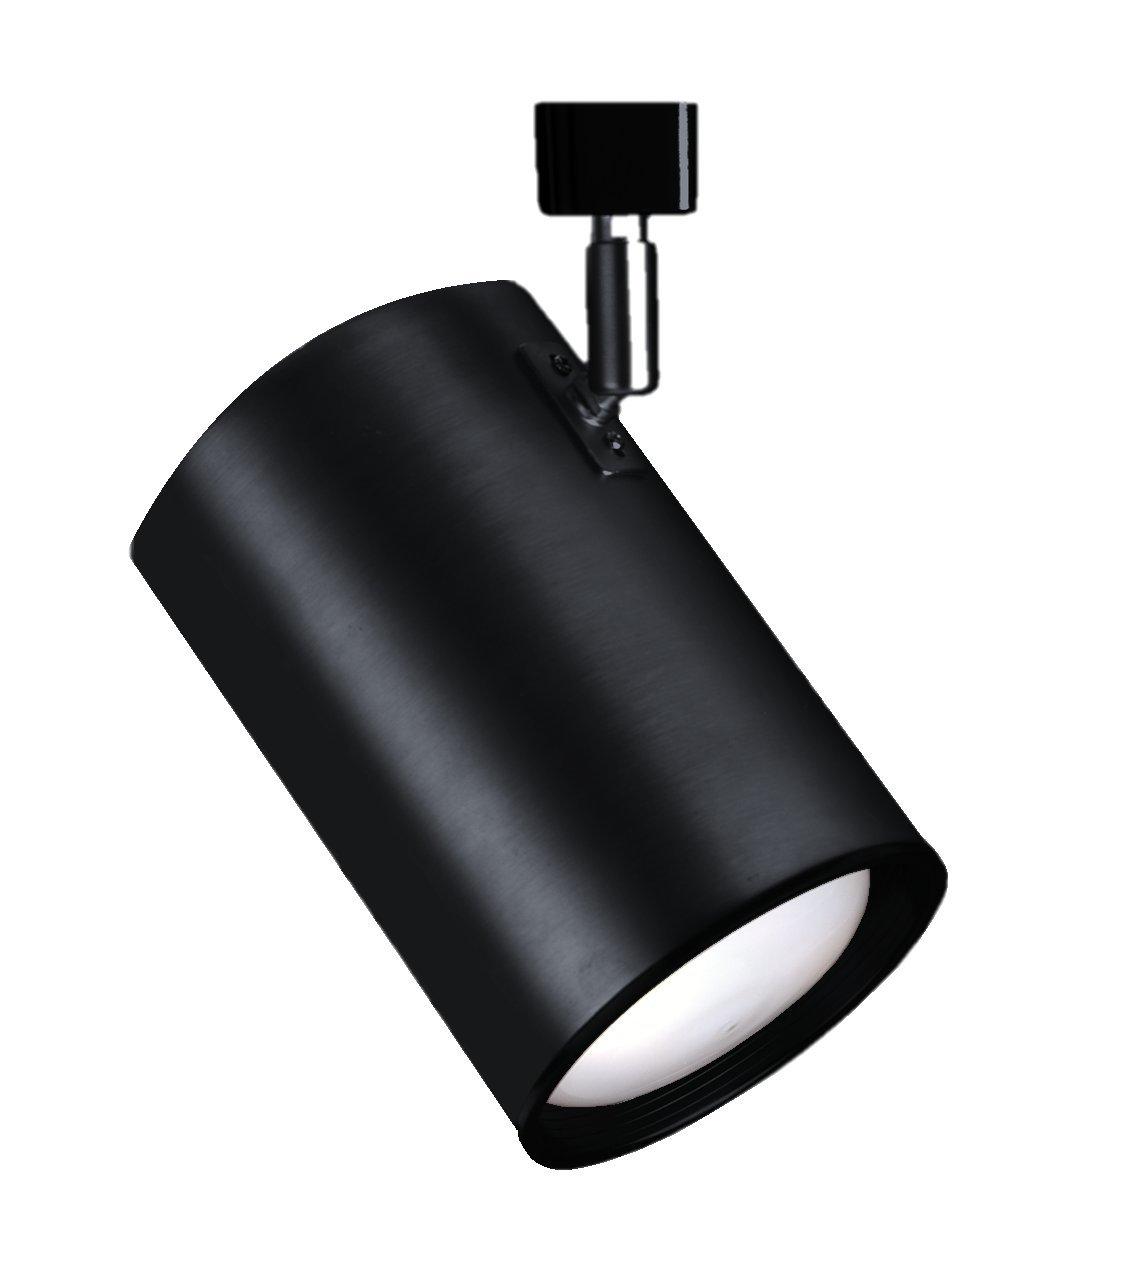 NICOR Lighting 75-Watt Flat Back Cylinder Adjustable Directional Track Light Head, Black (10315BK)